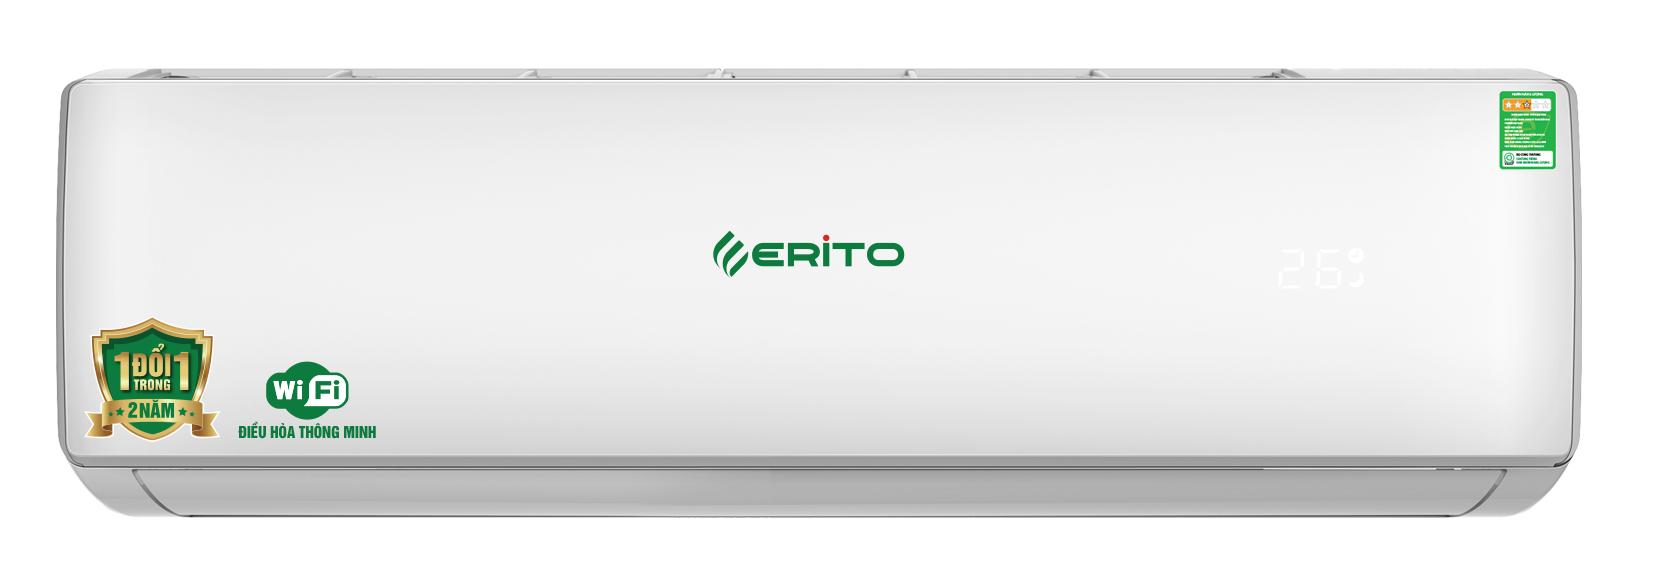 Điều hòa Erito Inverter 24000 BTU một chiều